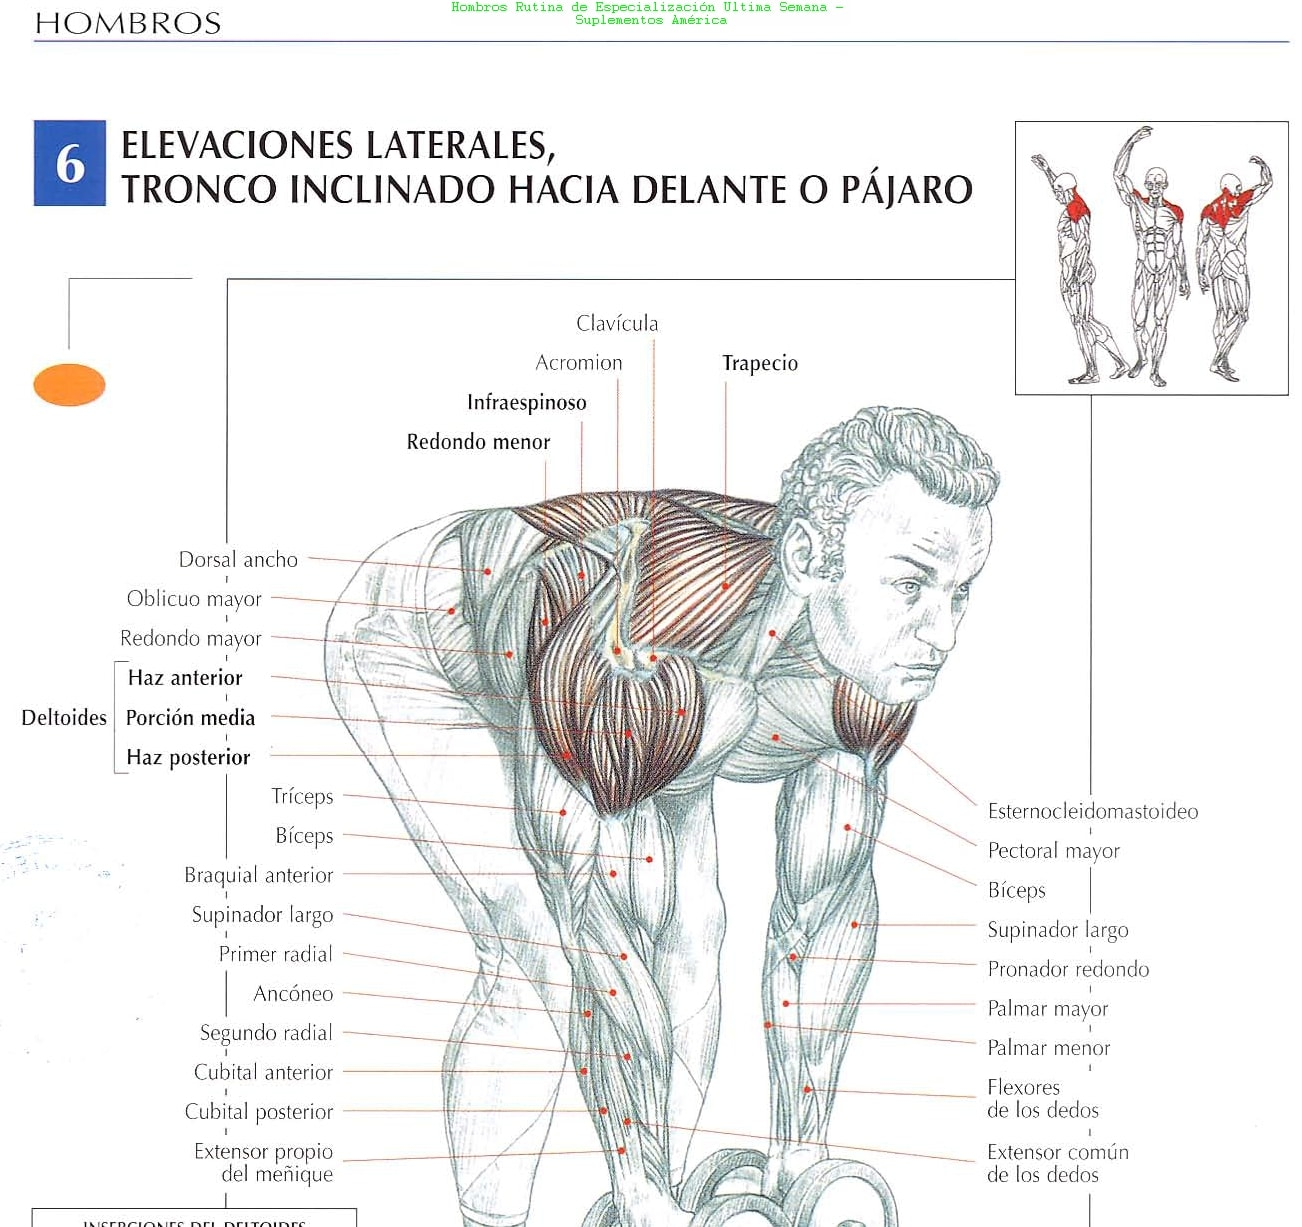 Rutina de ejercicios para hombros ejercicios en casa - Rutinas para casa ...